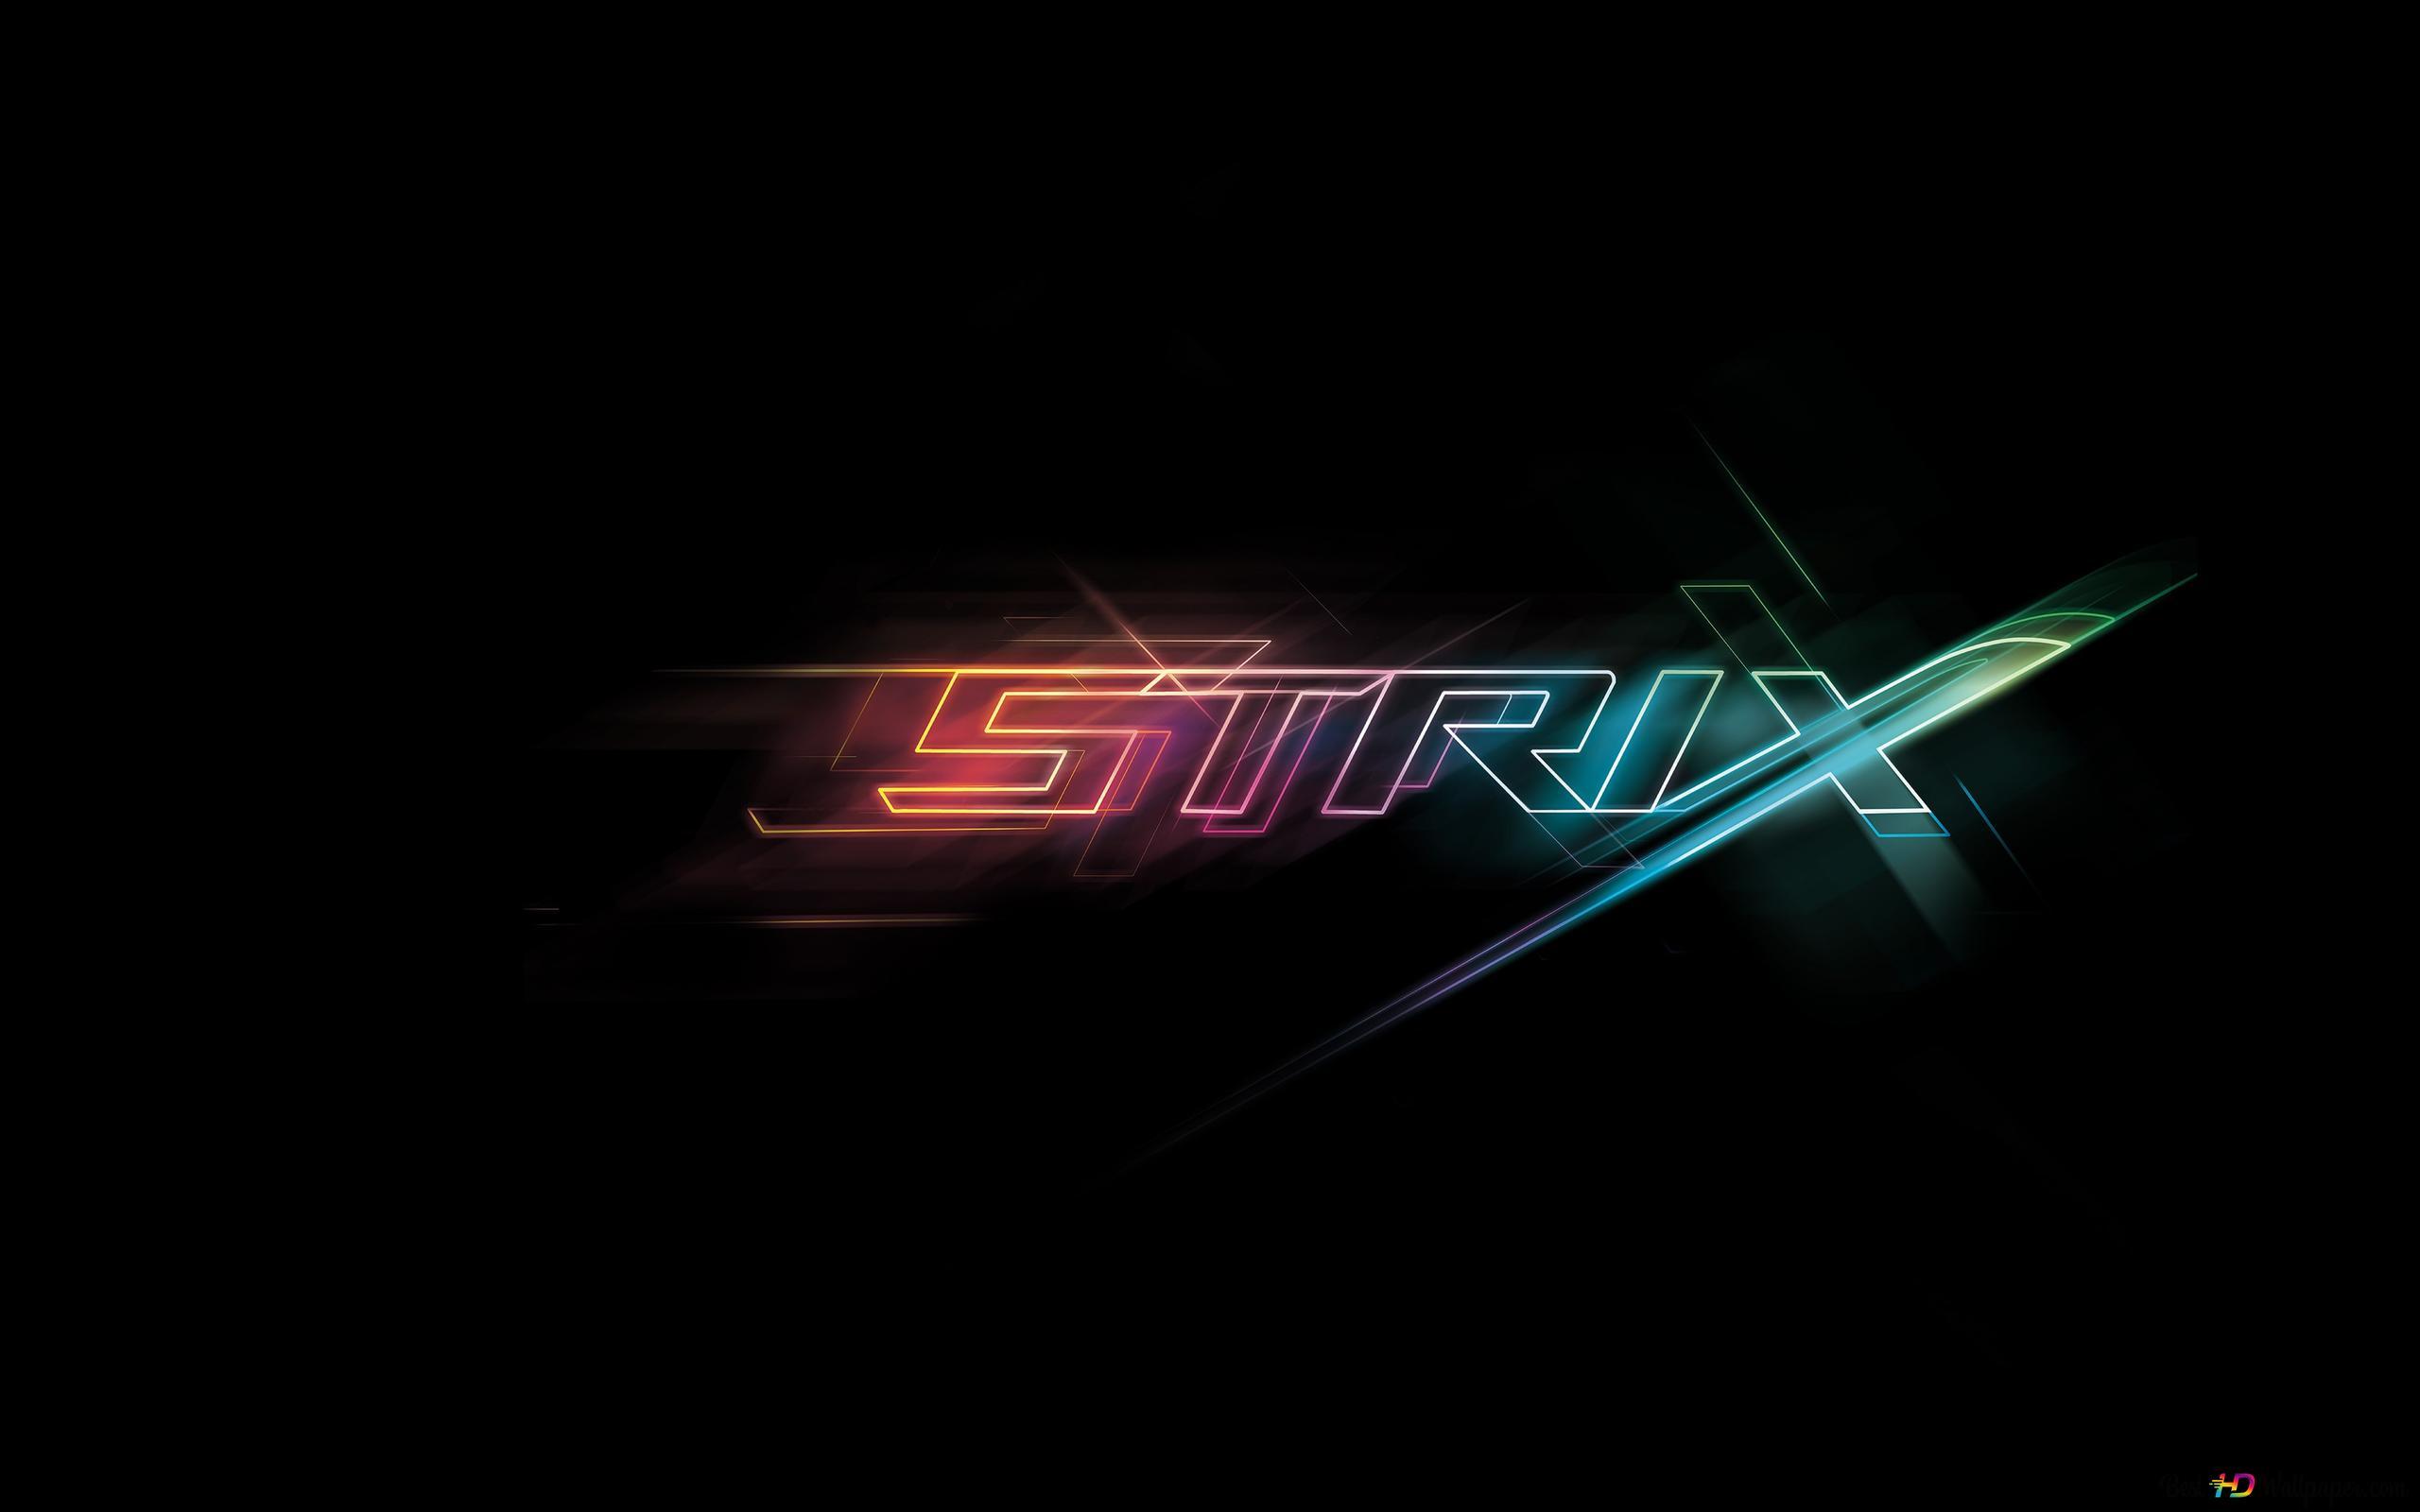 Asus Rog Republic Of Gamers Strix Hd Wallpaper Download